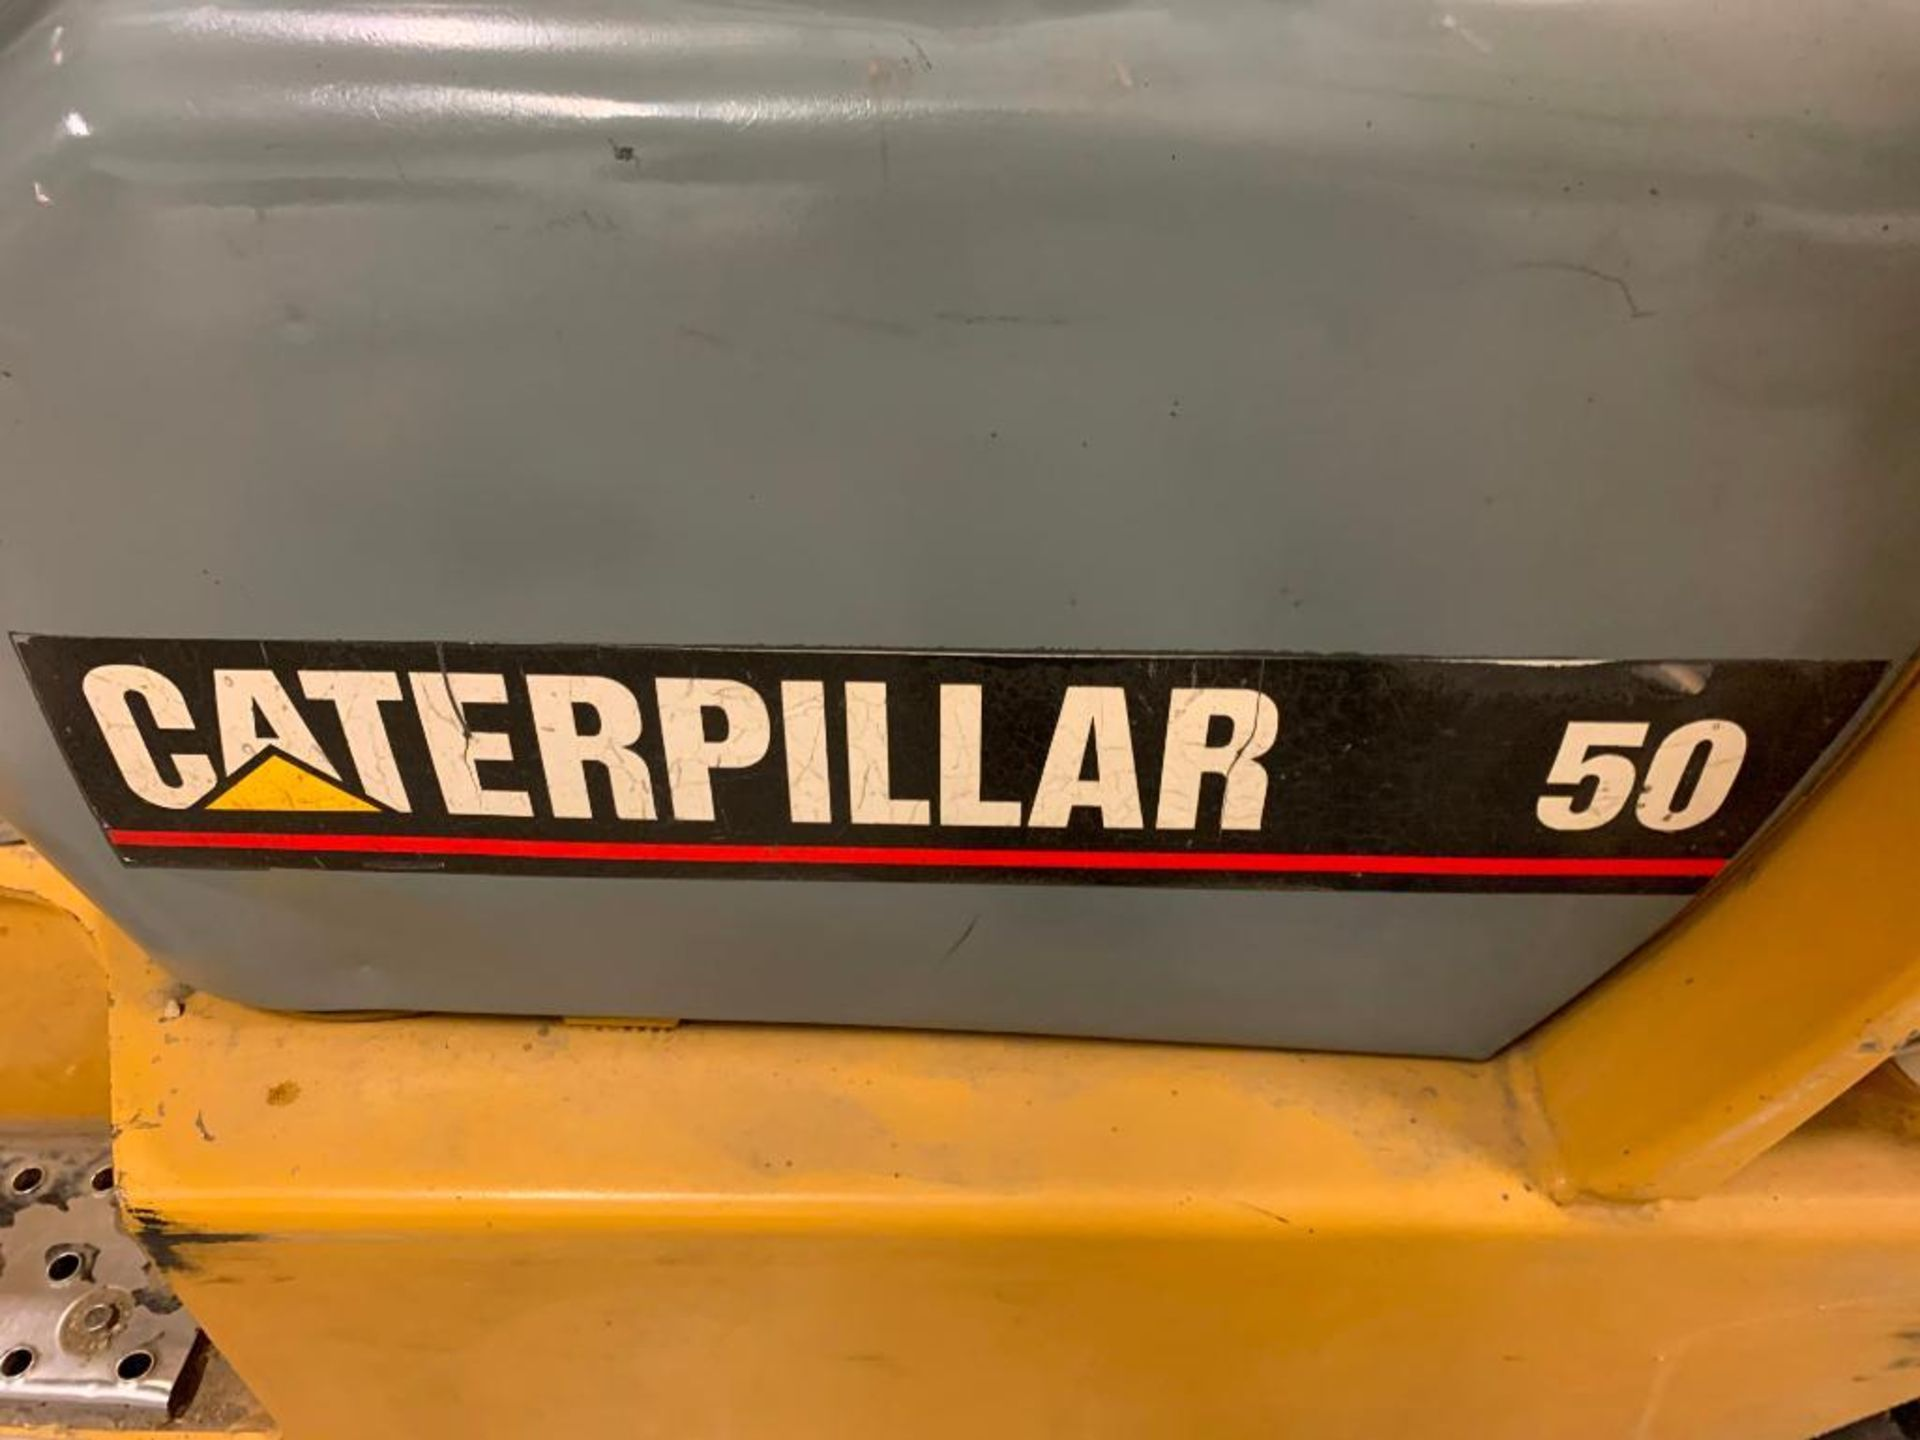 Catepillar fork truck, LP gas - Image 13 of 13